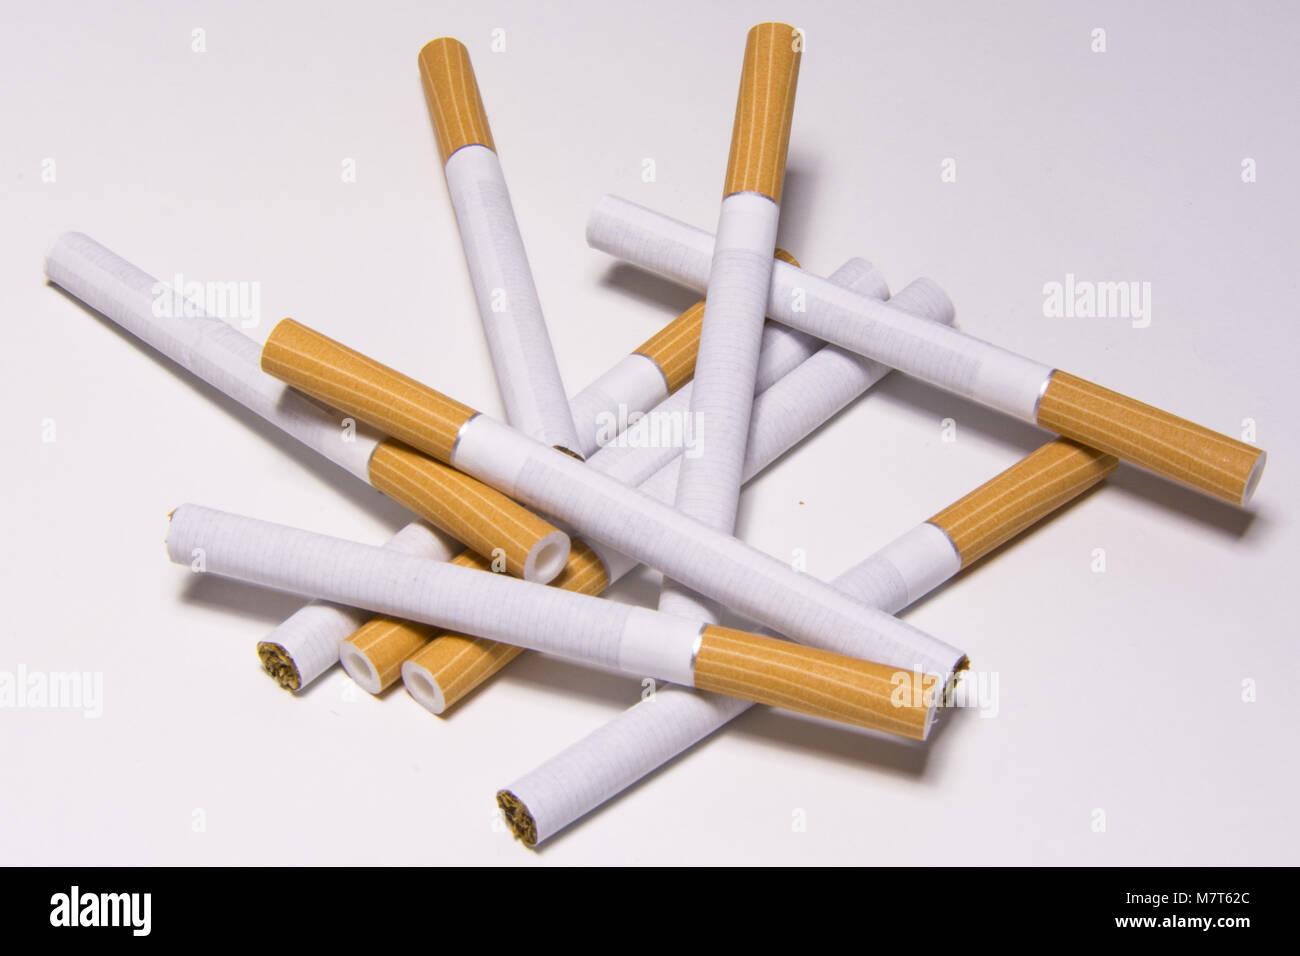 Cigarette on white background, unhealthy lifestyle, toxic nicotine - Stock Image